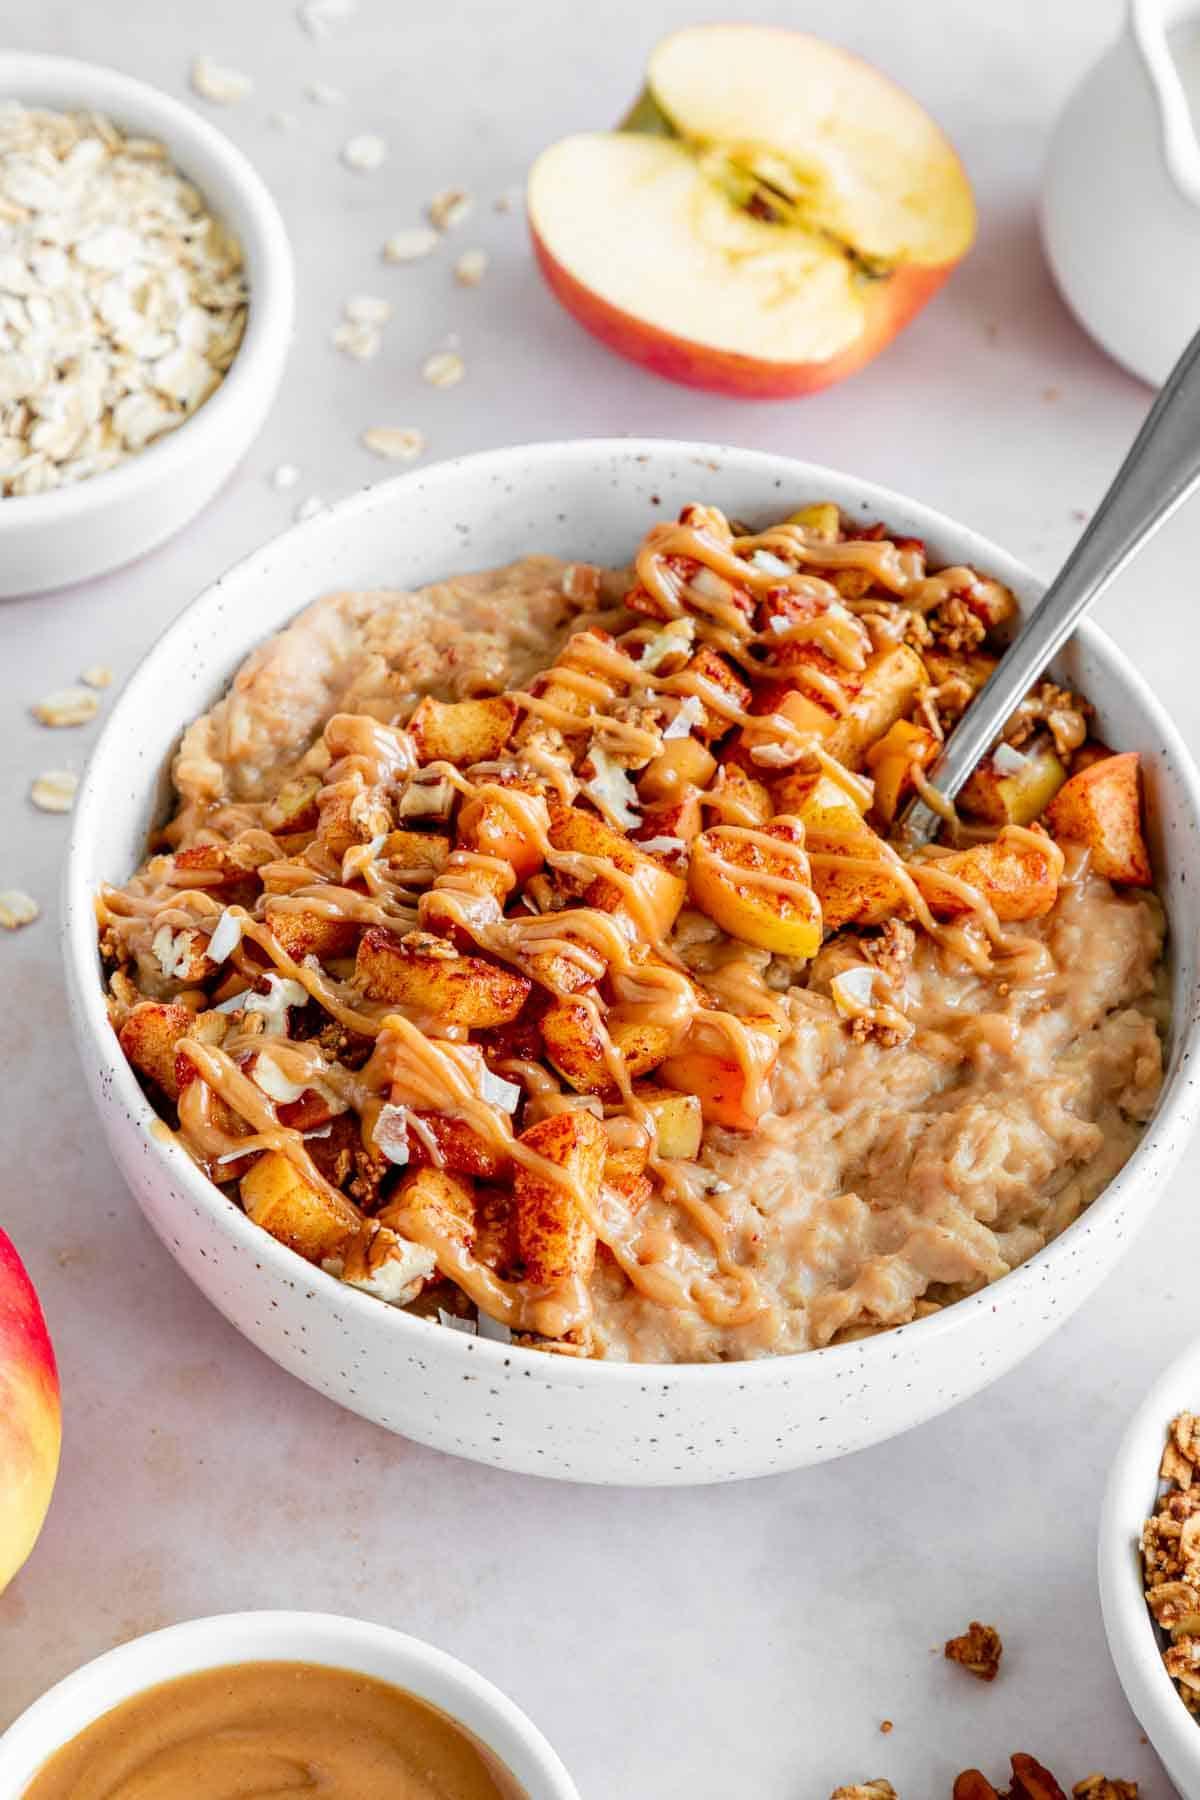 a bowl of vegan caramel apple oatmeal with pecans, diced honey crisp apples, cinnamon, and granola on top